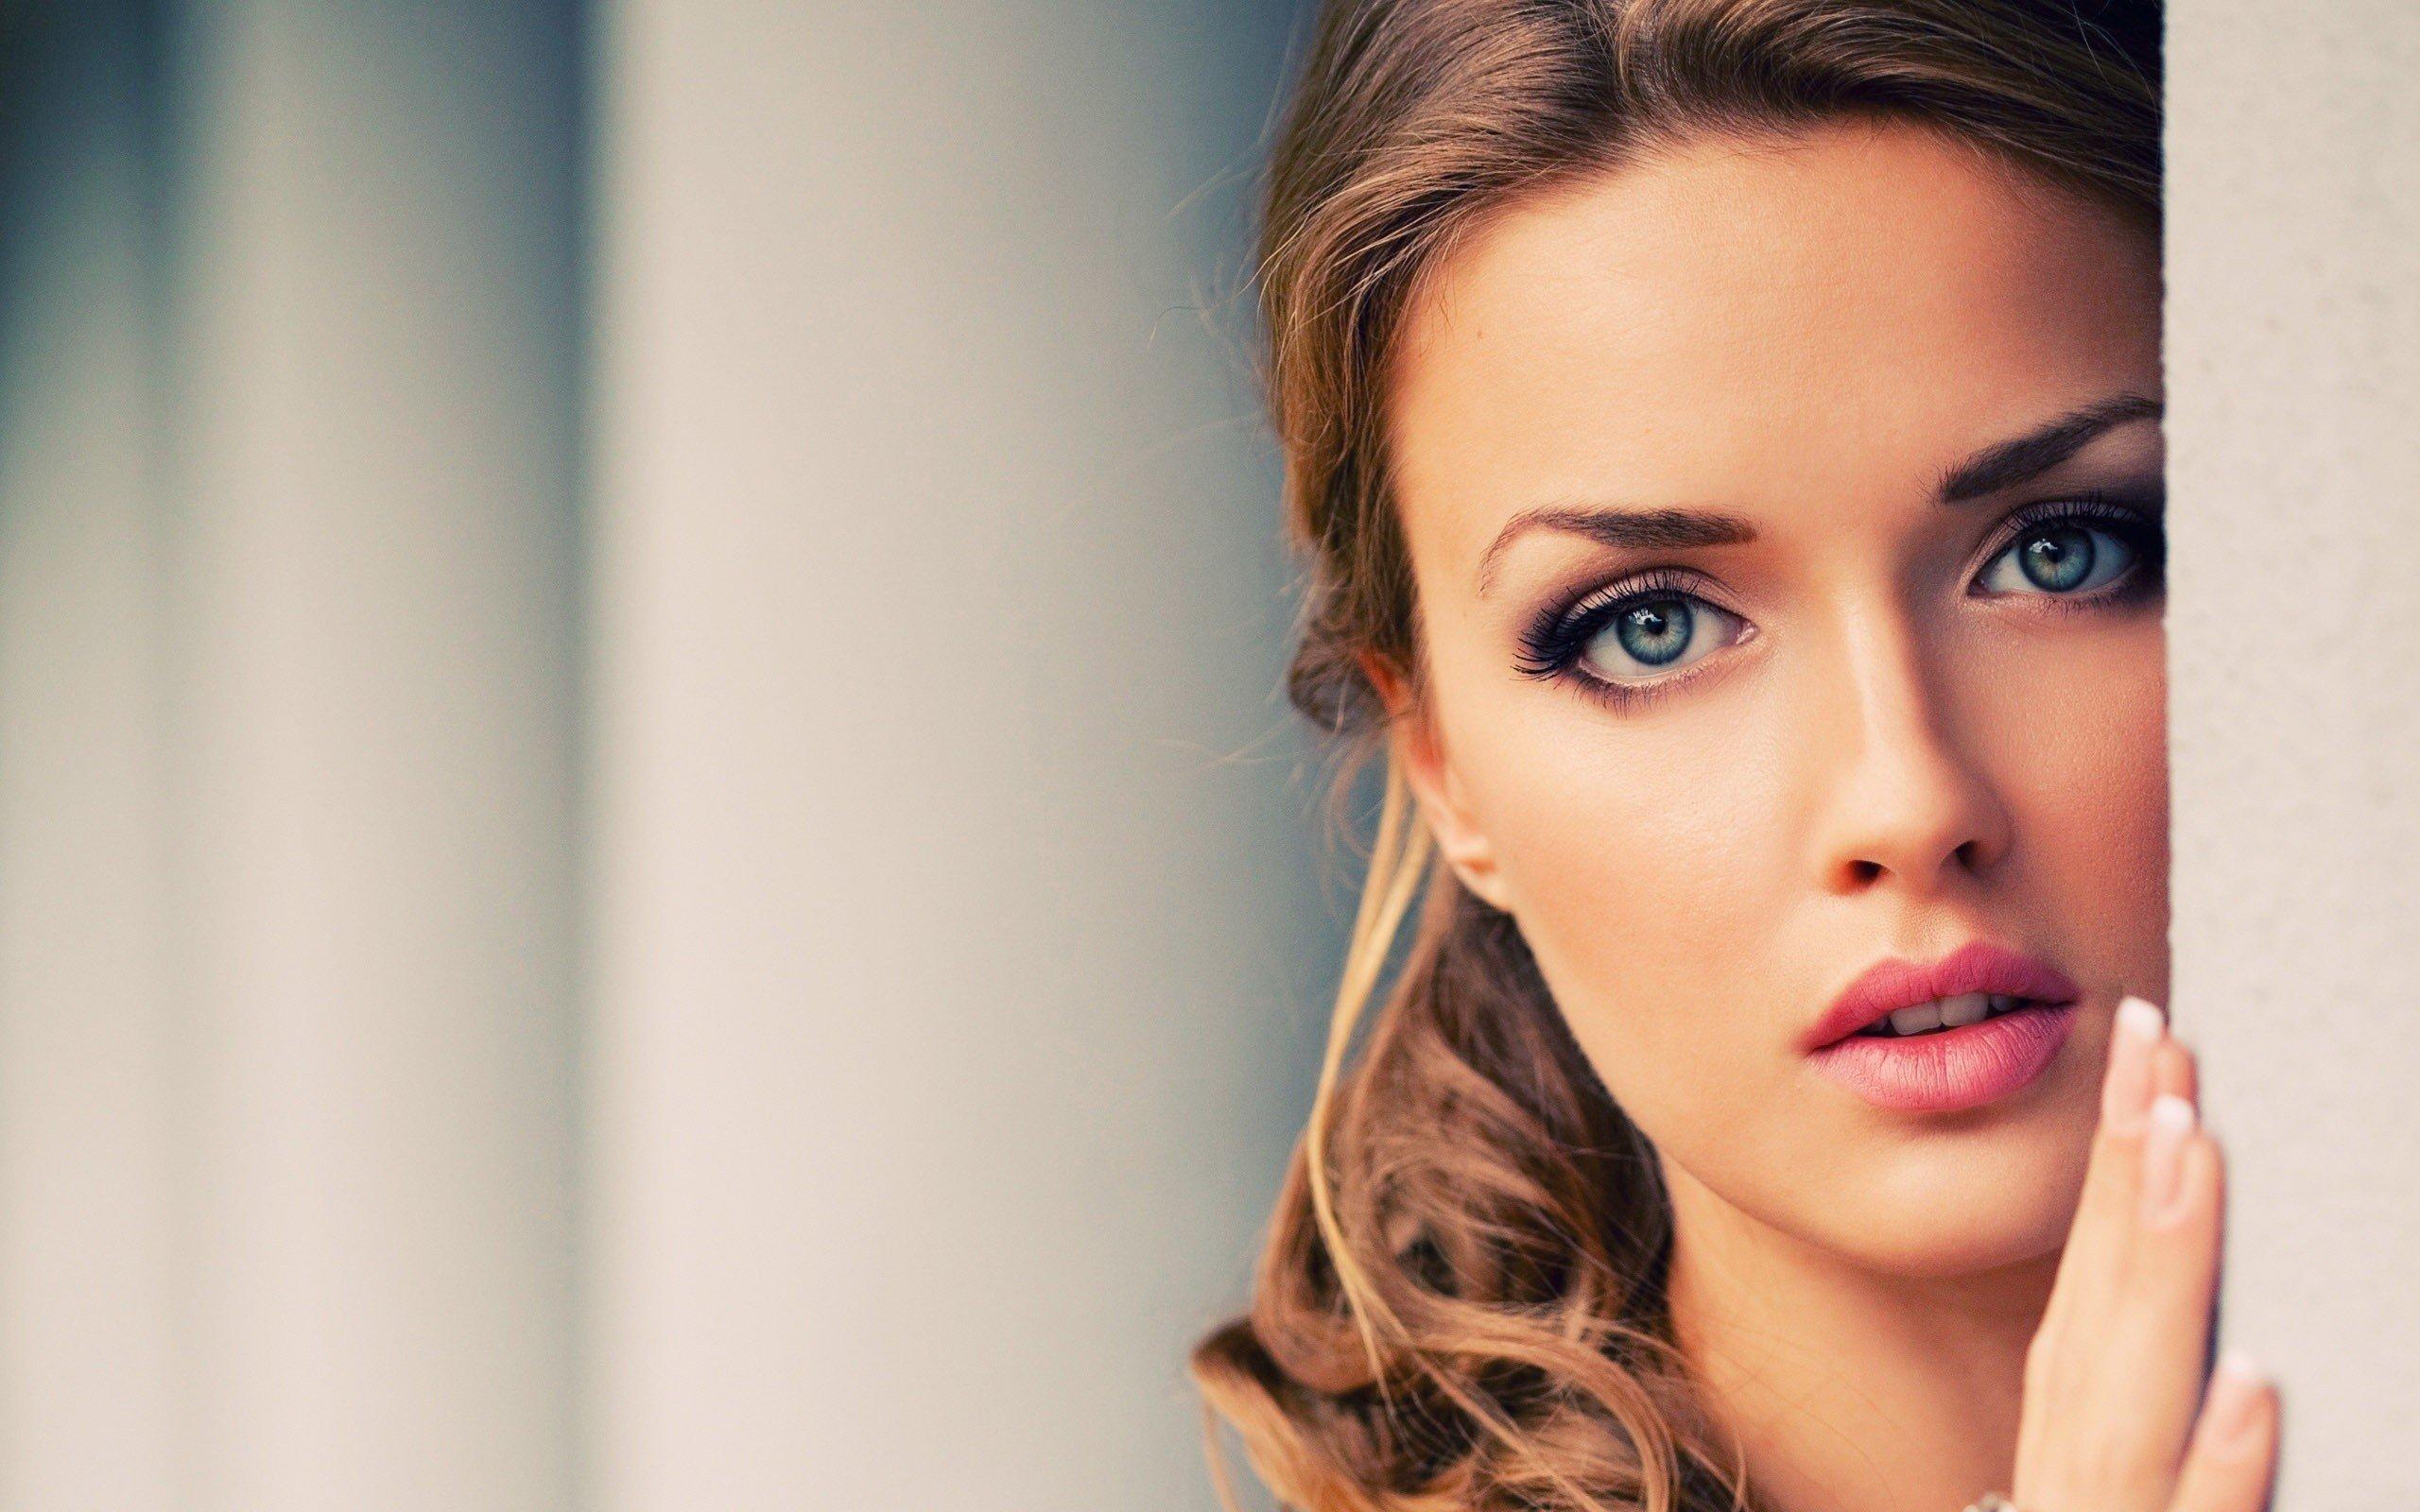 Women Model Face Brunette Blue Eyes Hd Wallpapers Desktop And Mobile Images Photos